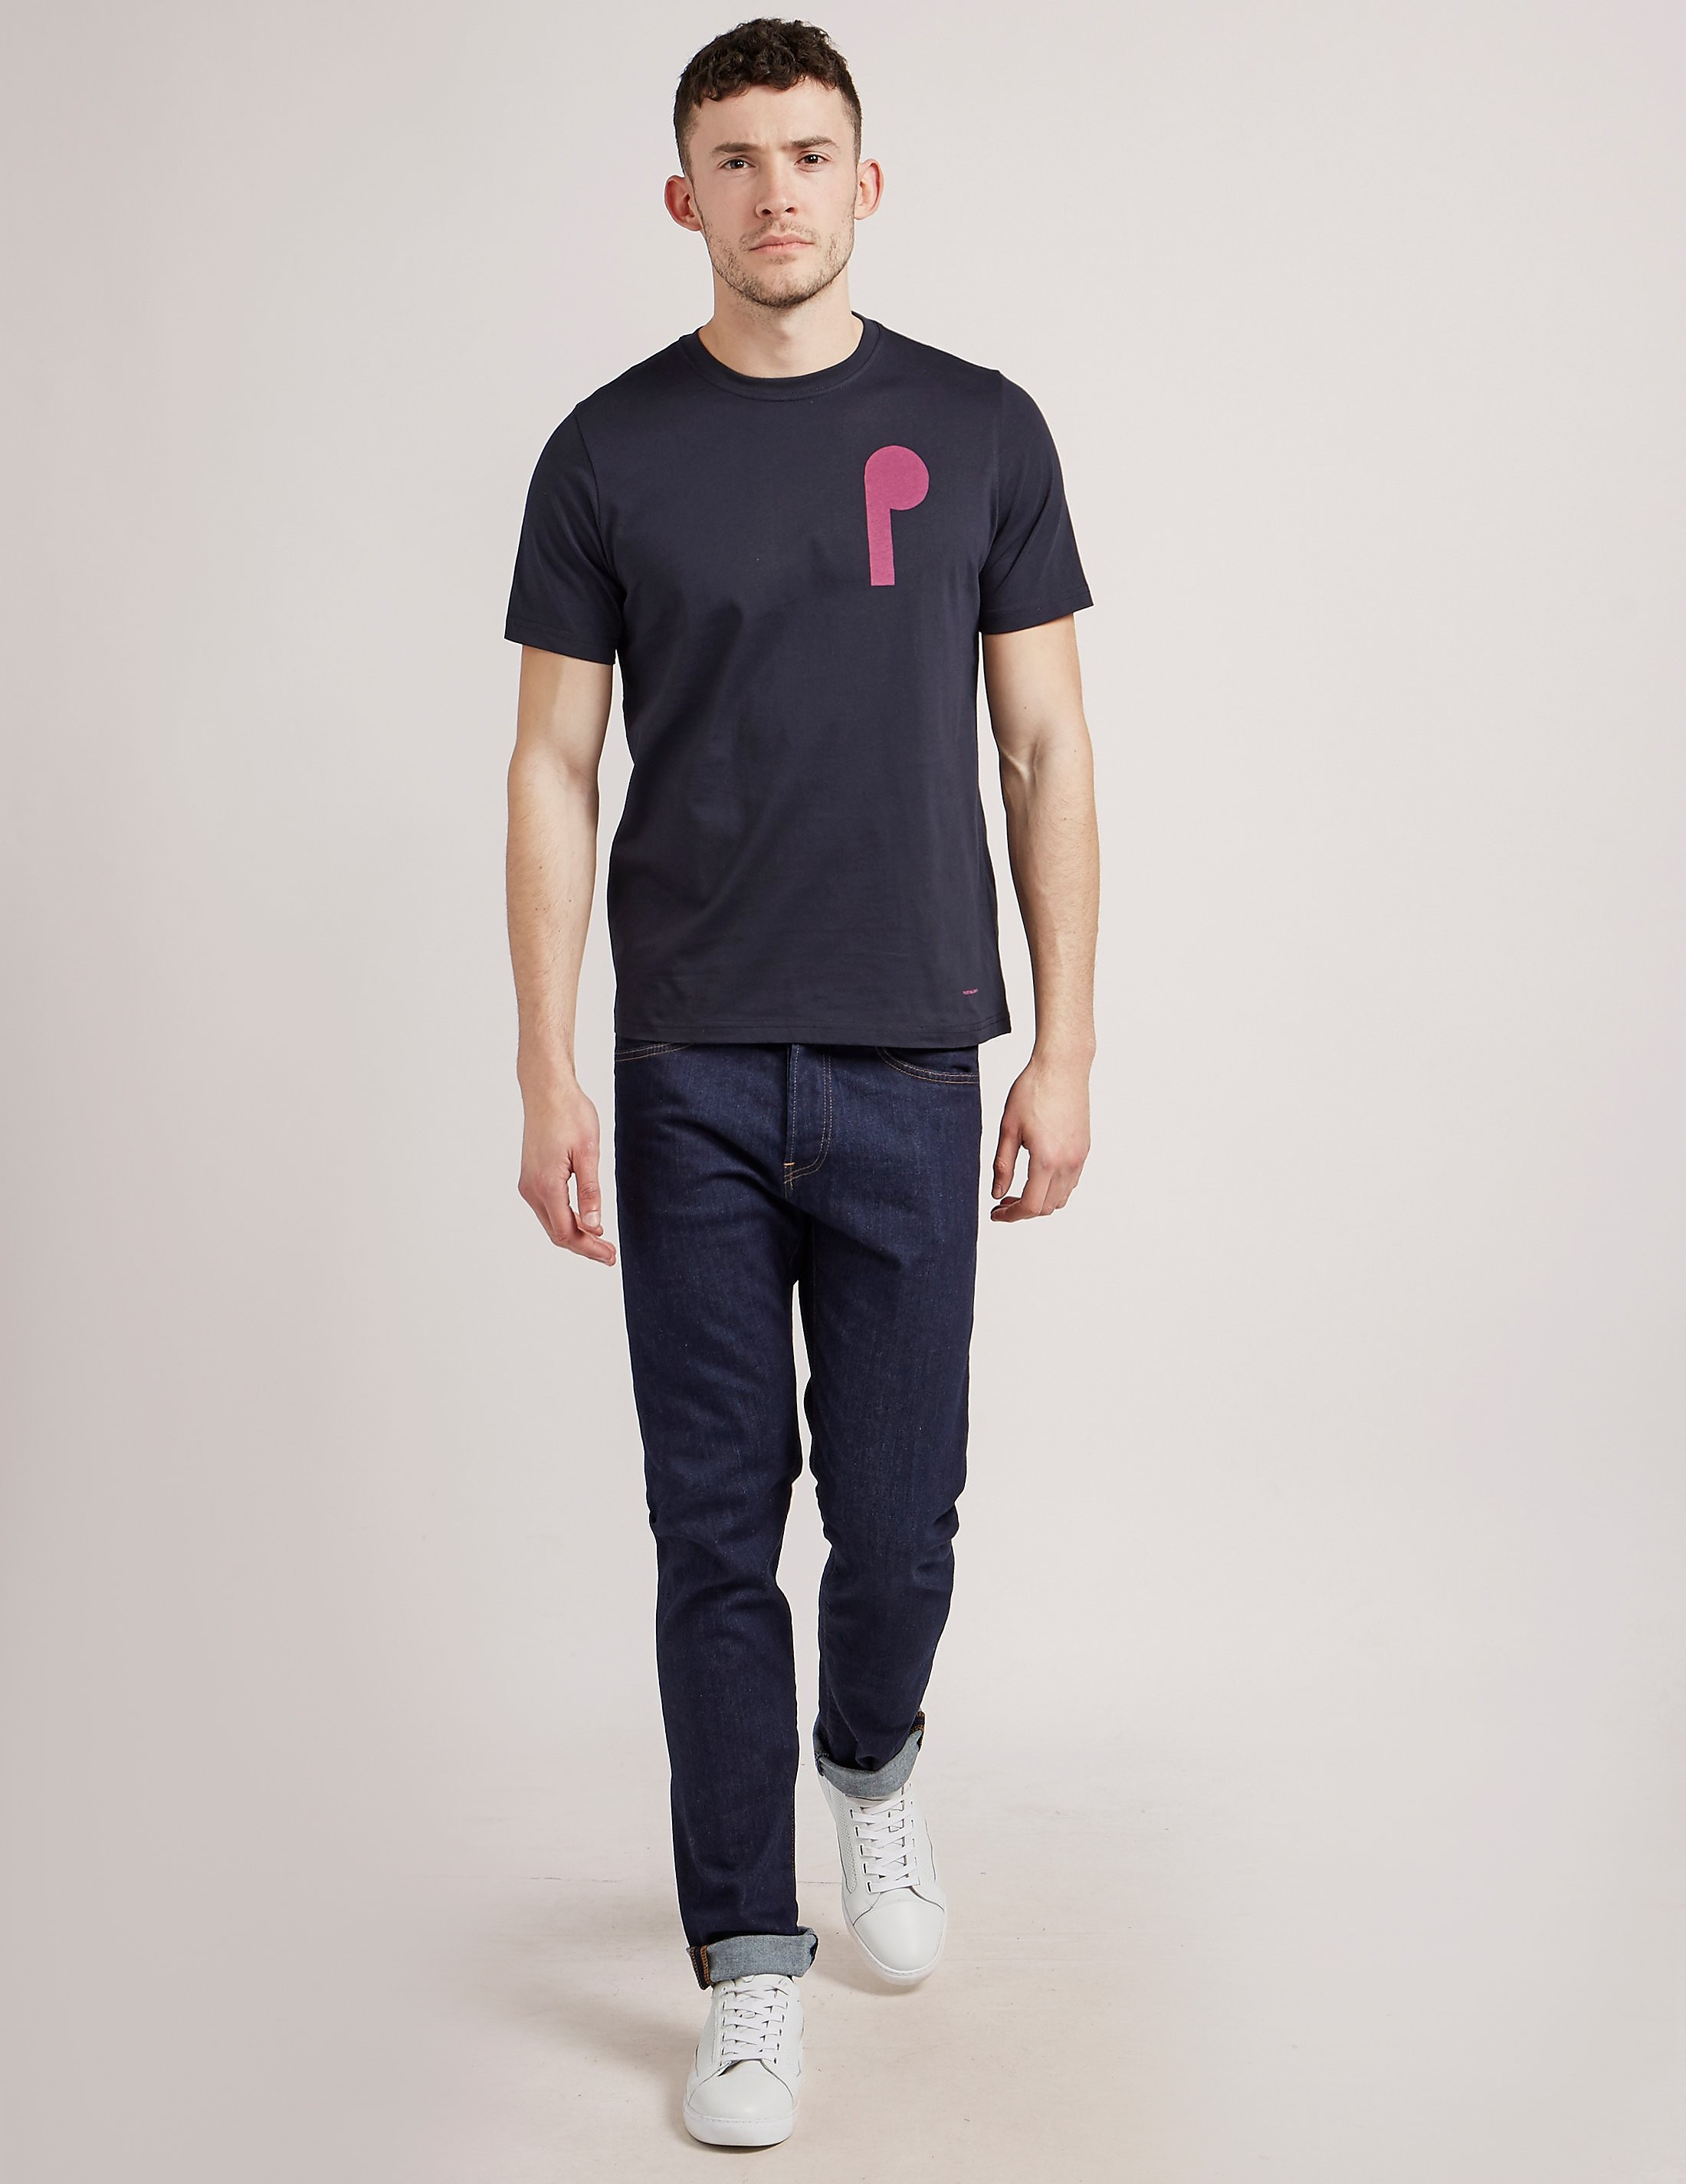 Paul Smith Print T-Shirt